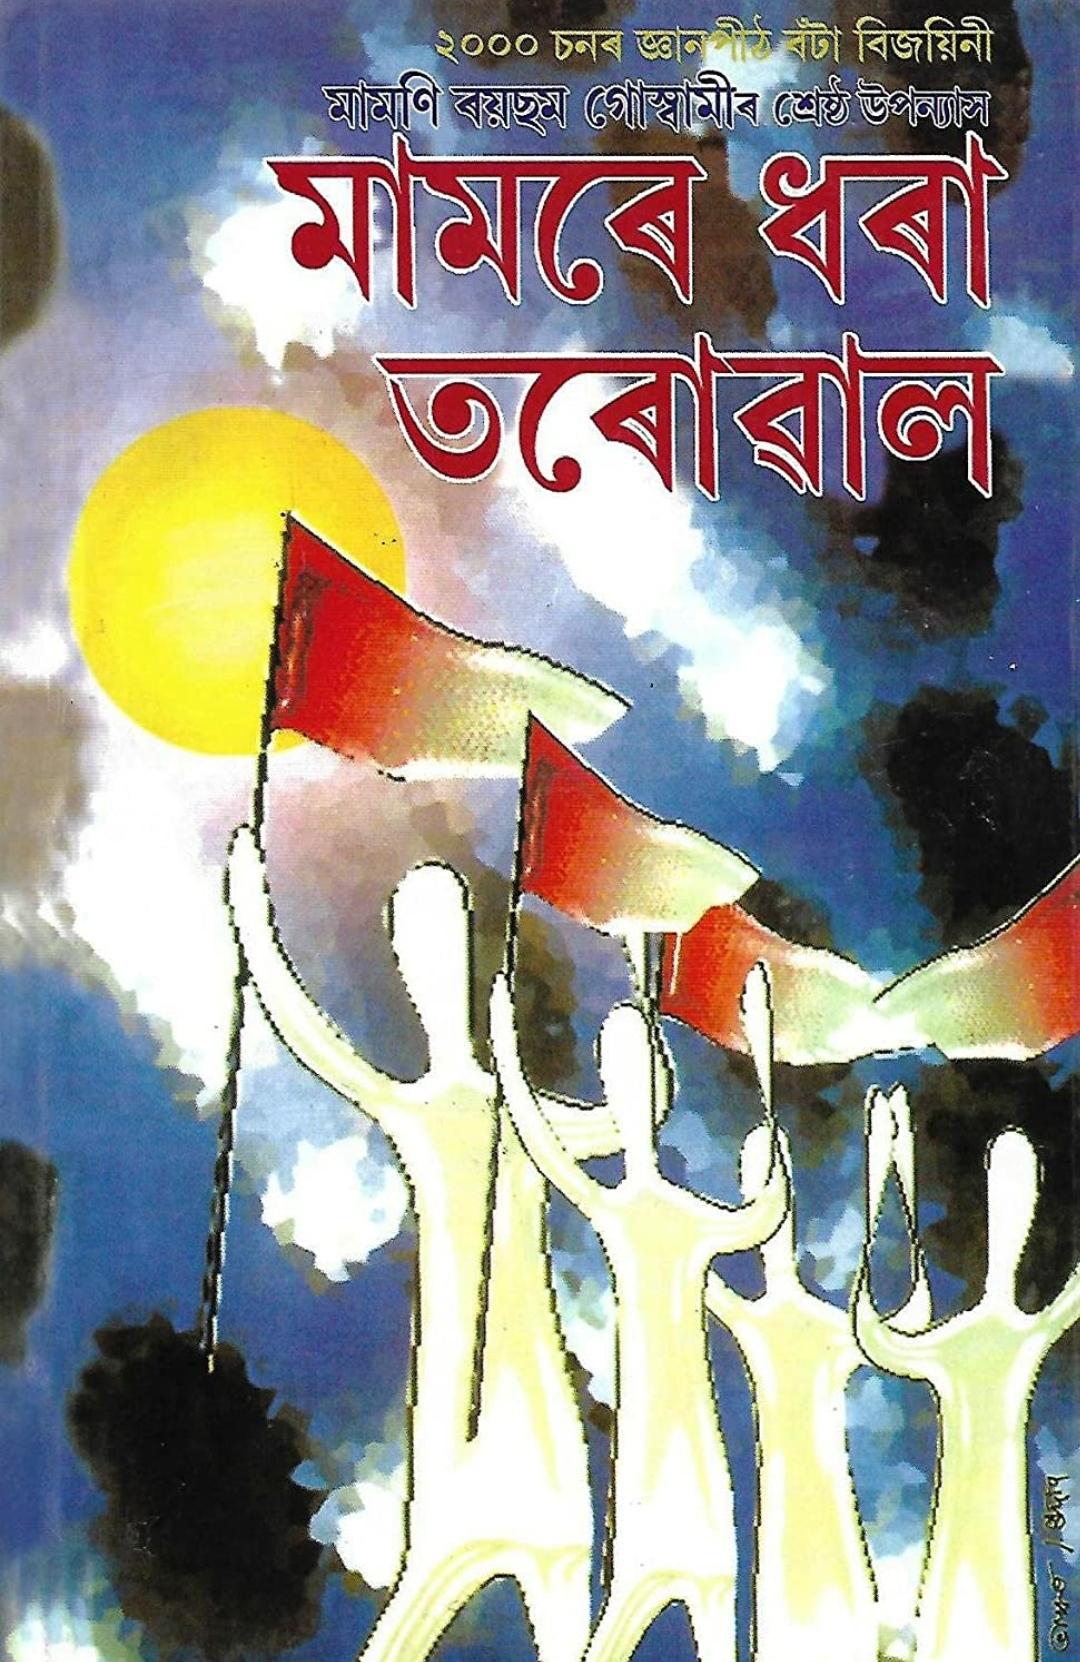 Mamare Dhara Tarowal Aru Dukhan Upanyas (মামৰে ধৰা তৰোৱাল আৰু দুখন উপন্যাস)